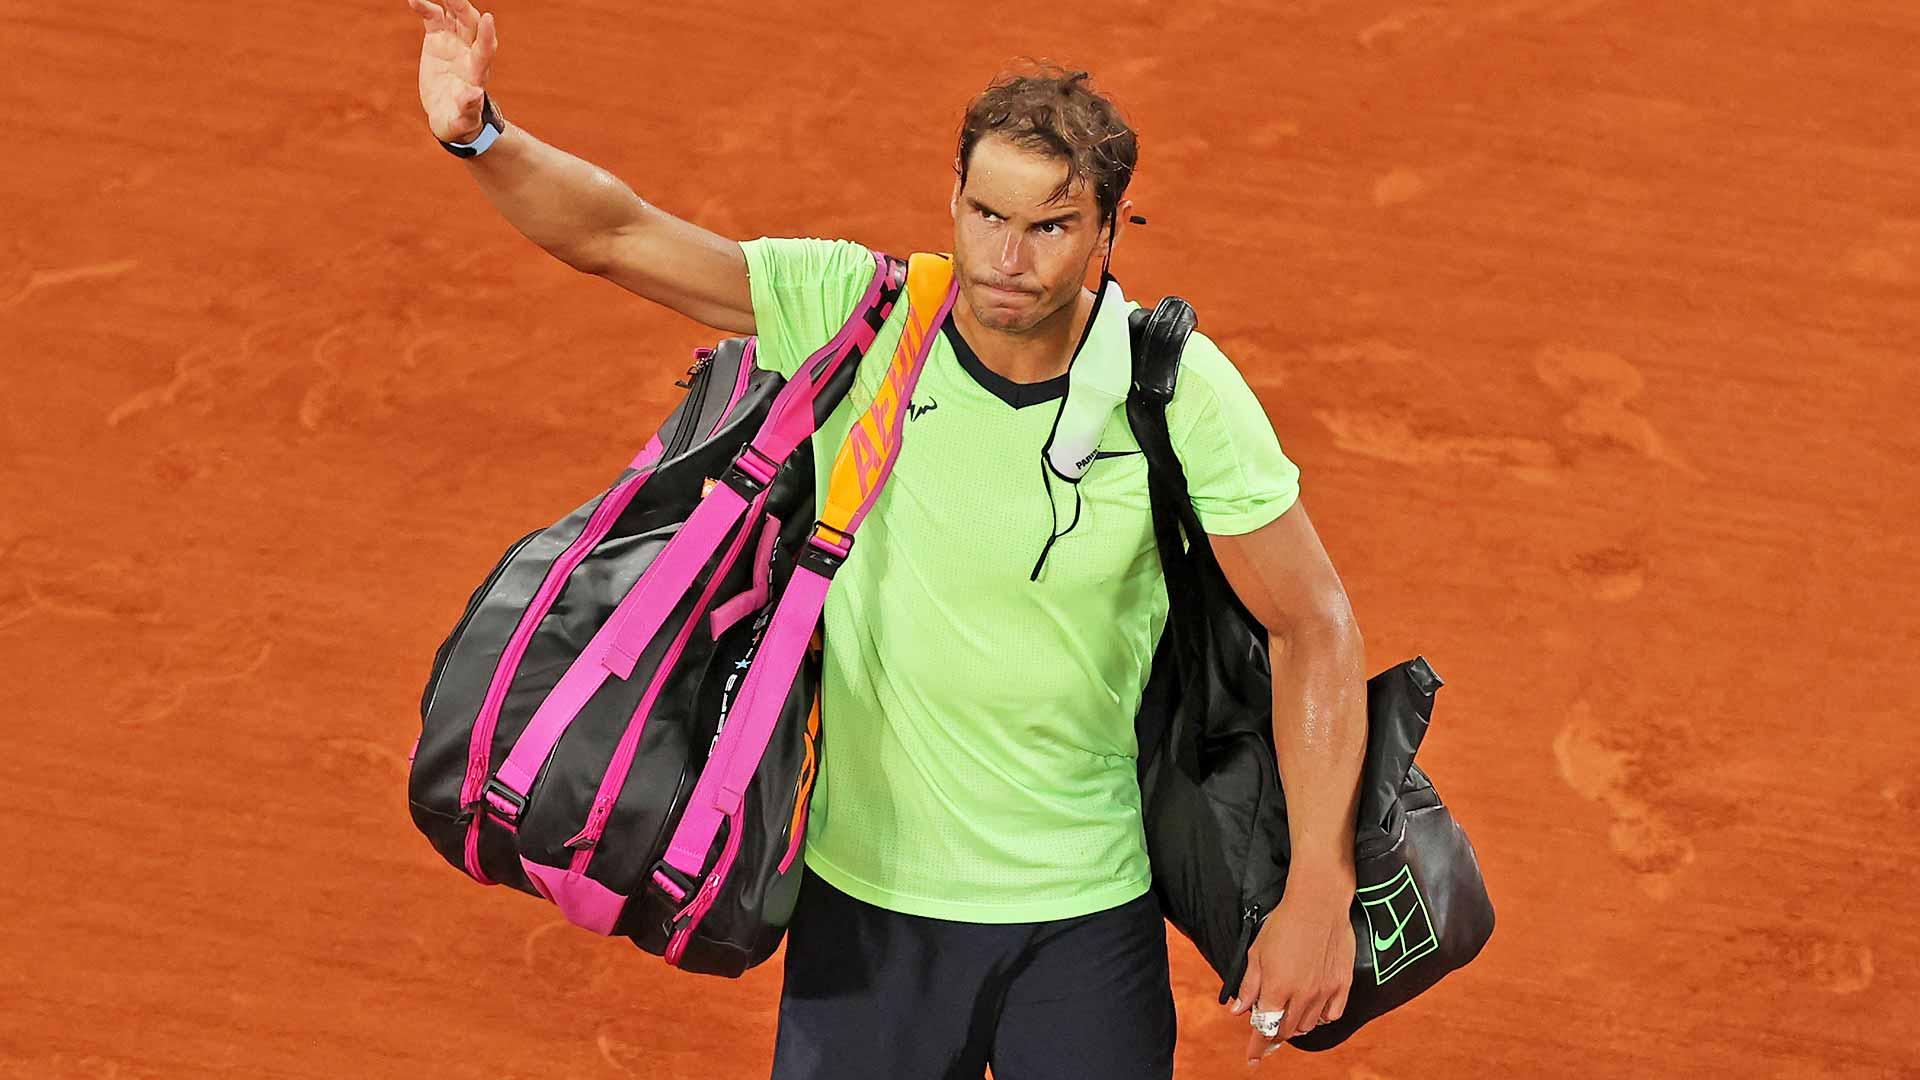 Rafael Nadal I Had A Big Chance Atp Tour Tennis